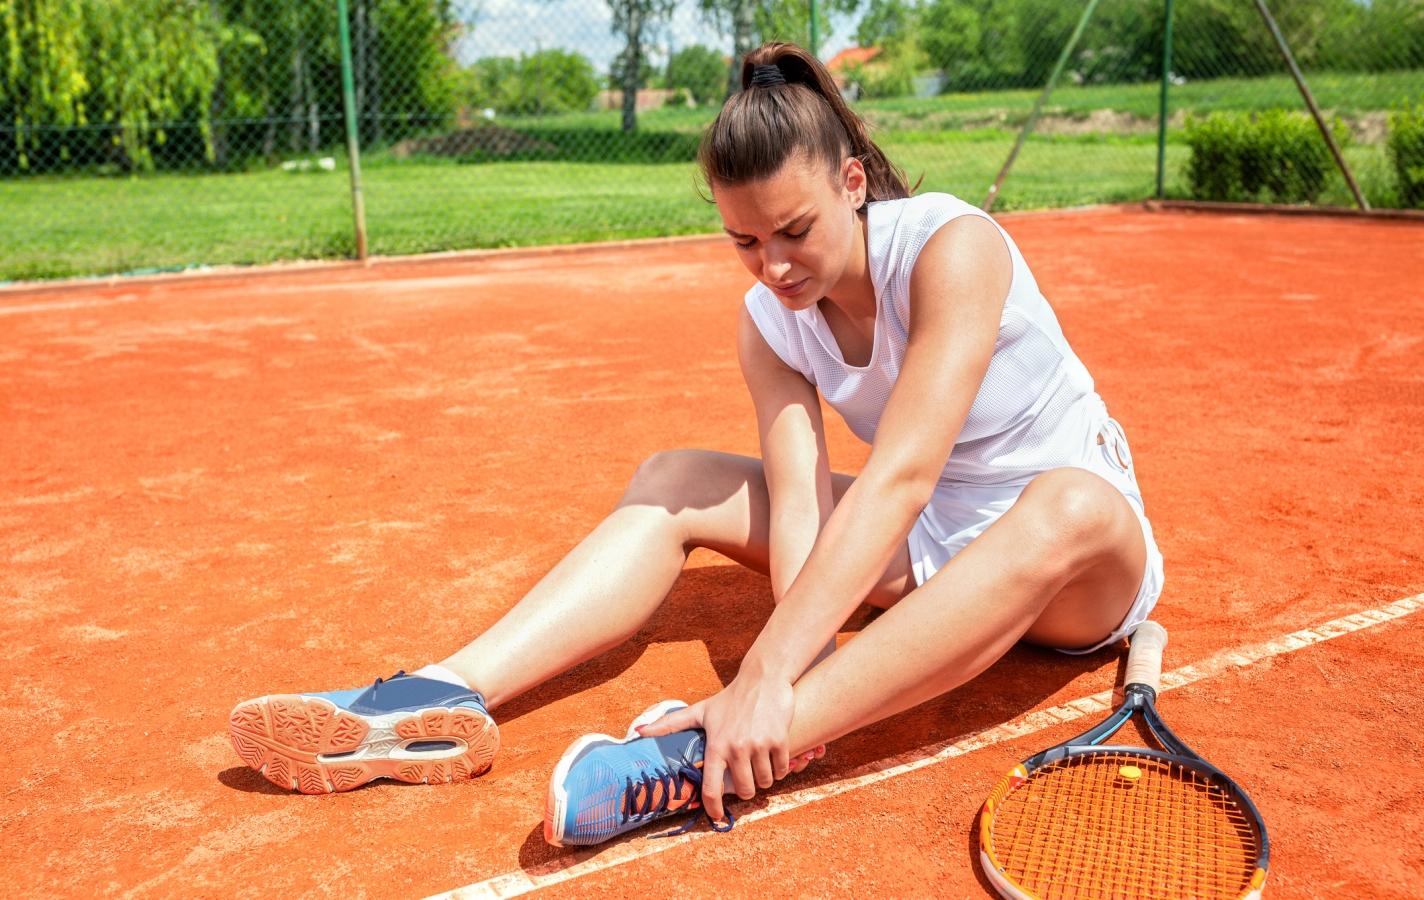 Leg injury on the tennis court